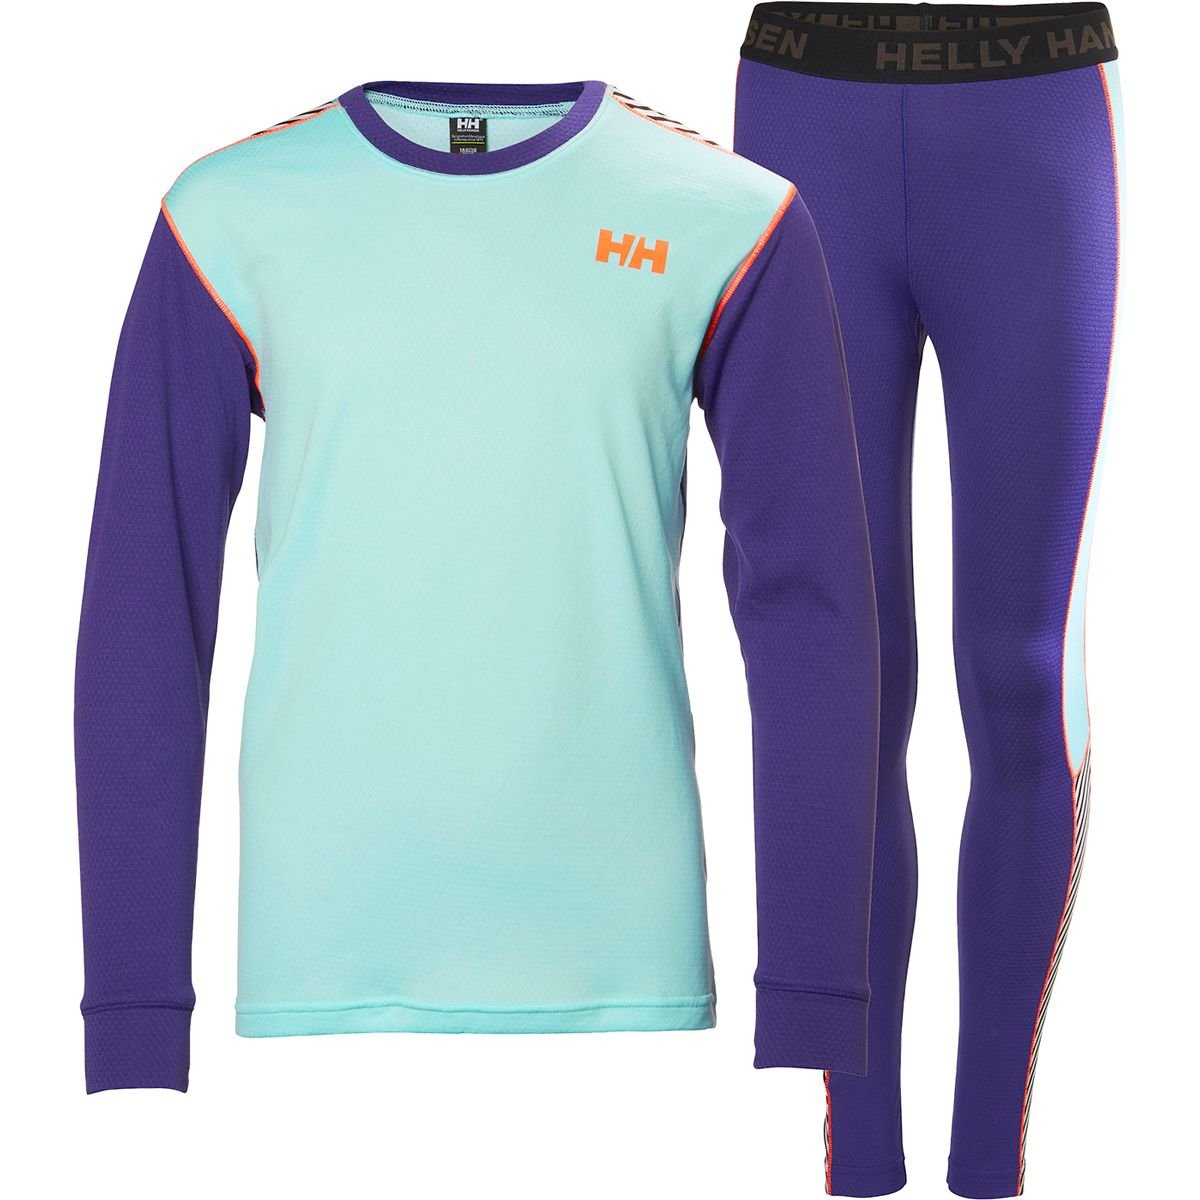 Helly Hansen Junior Lifa Active Baselayer Set, Lavender, Size 14